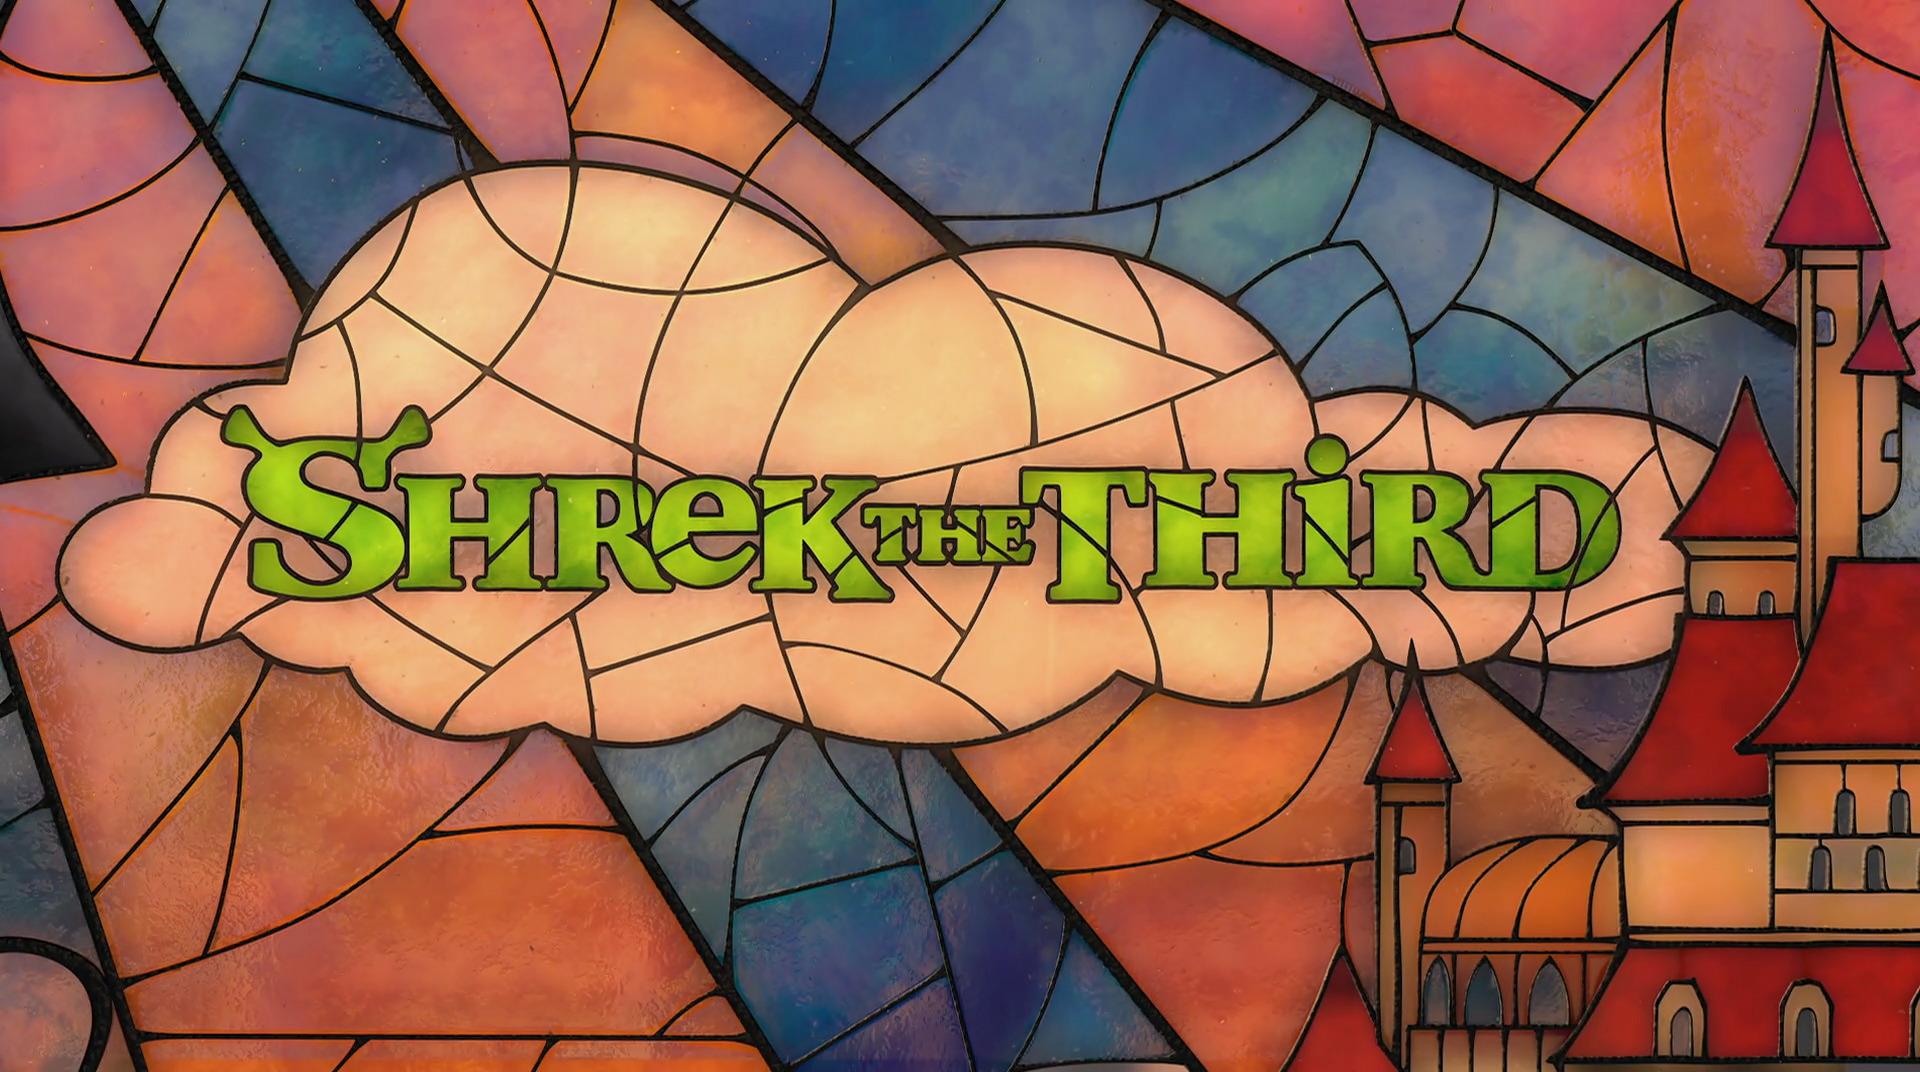 Shrek The Third 2007 Animation Screencaps